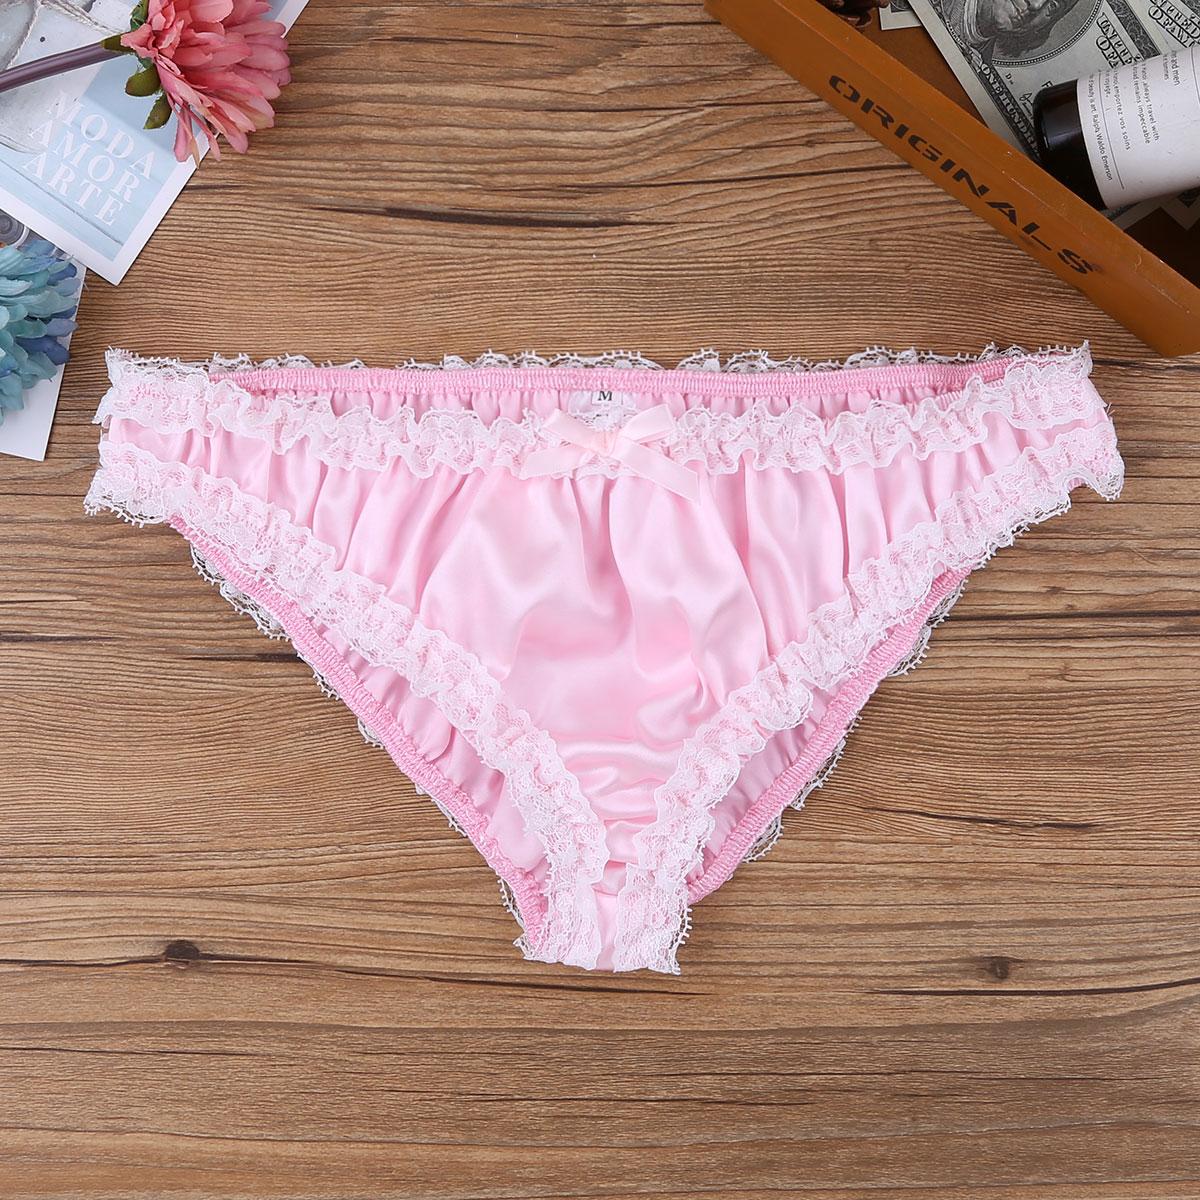 f51e408d21 Men Shiny Soft Pleated Sweet Bikini Briefs Satin Lace Ruffled Sissy Panties  Sexy Underwear Gay Male